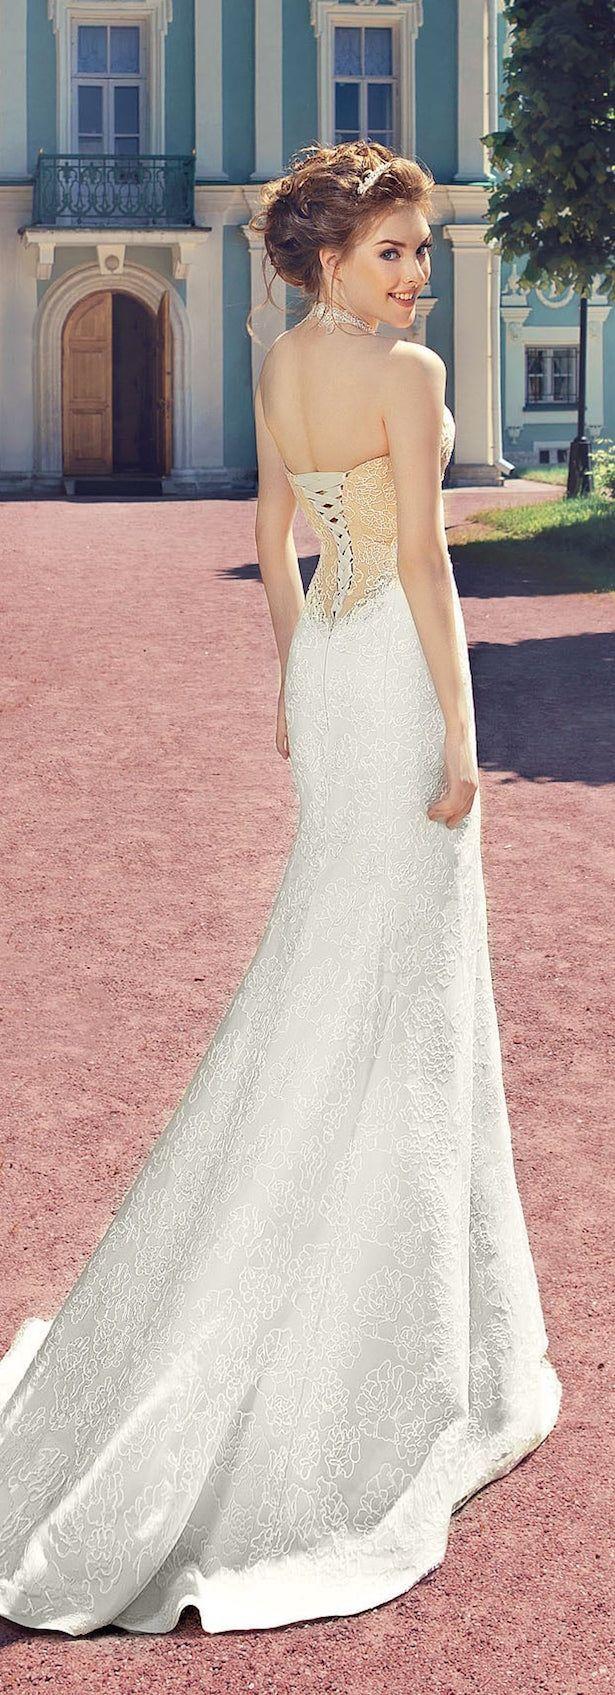 Mejores 80 imágenes de Wedding dresses en Pinterest | Vestidos de ...